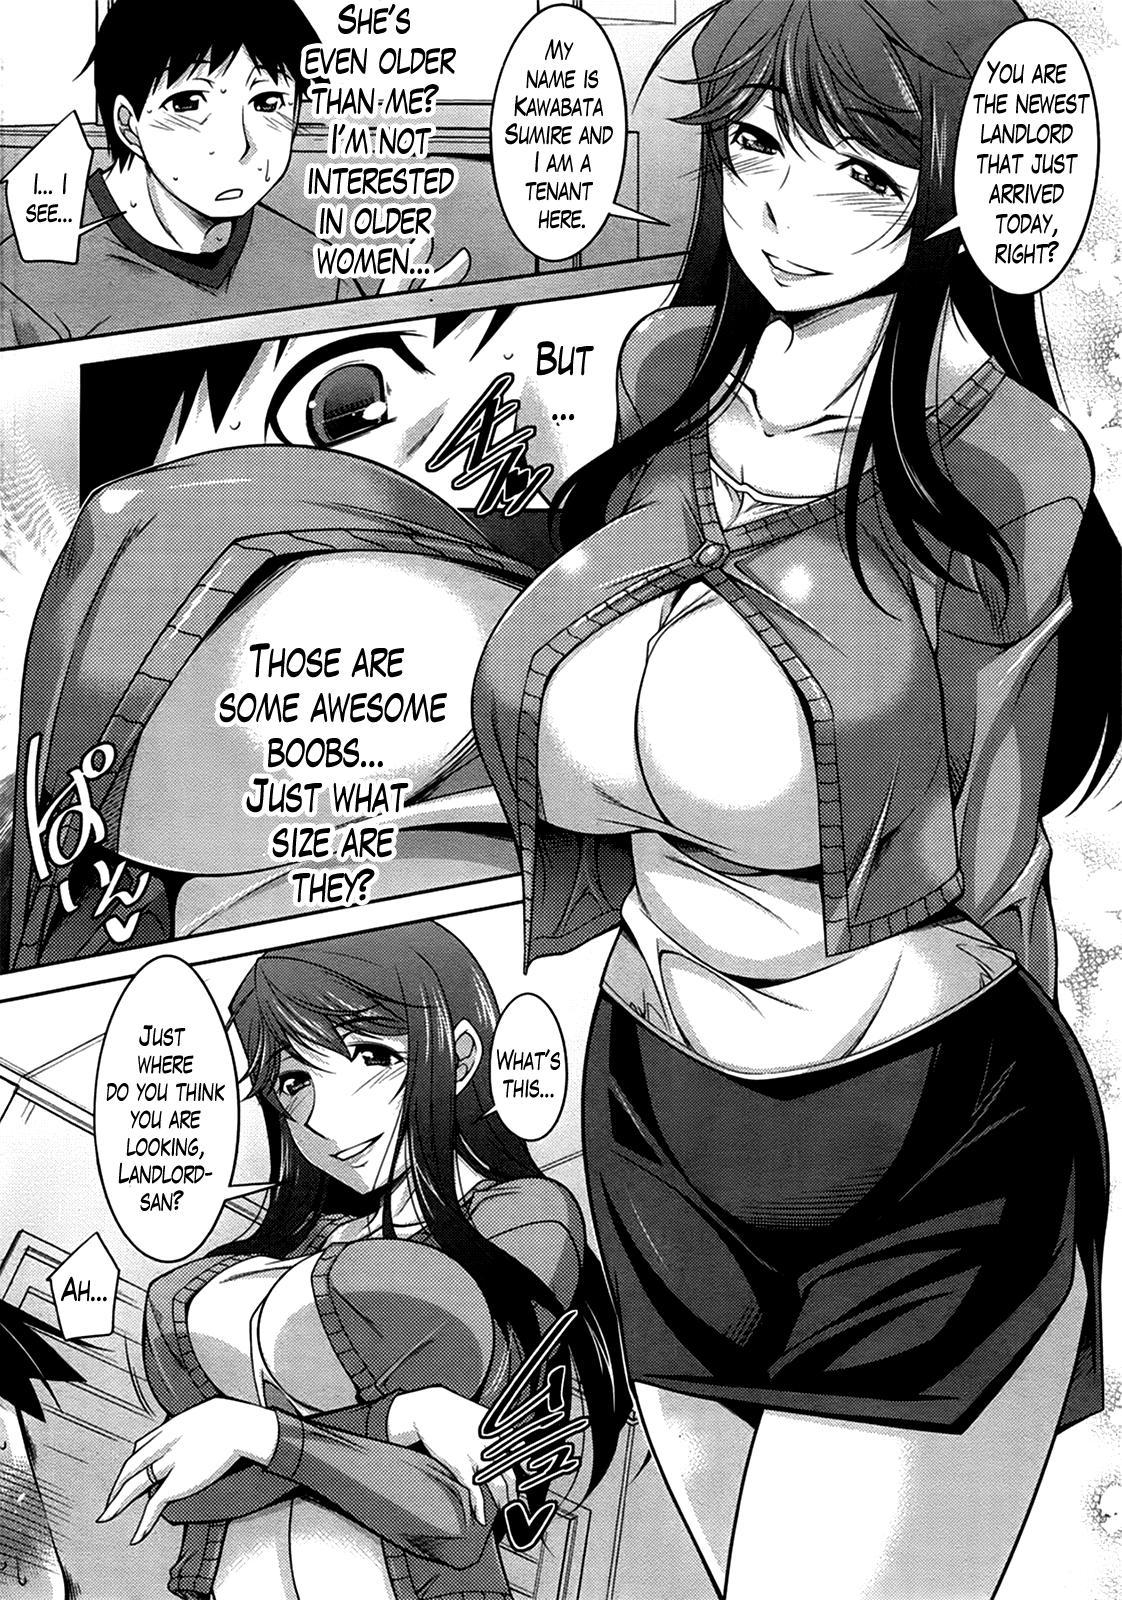 [Zen9] Taikutsu na Gogo no Sugoshikata Ch. 1-5   A Way to Spend a Boring Afternoon Ch. 1-5 (Action Pizazz DX 2013-12) [English](hentai2read.com)[Lazarus H] 8